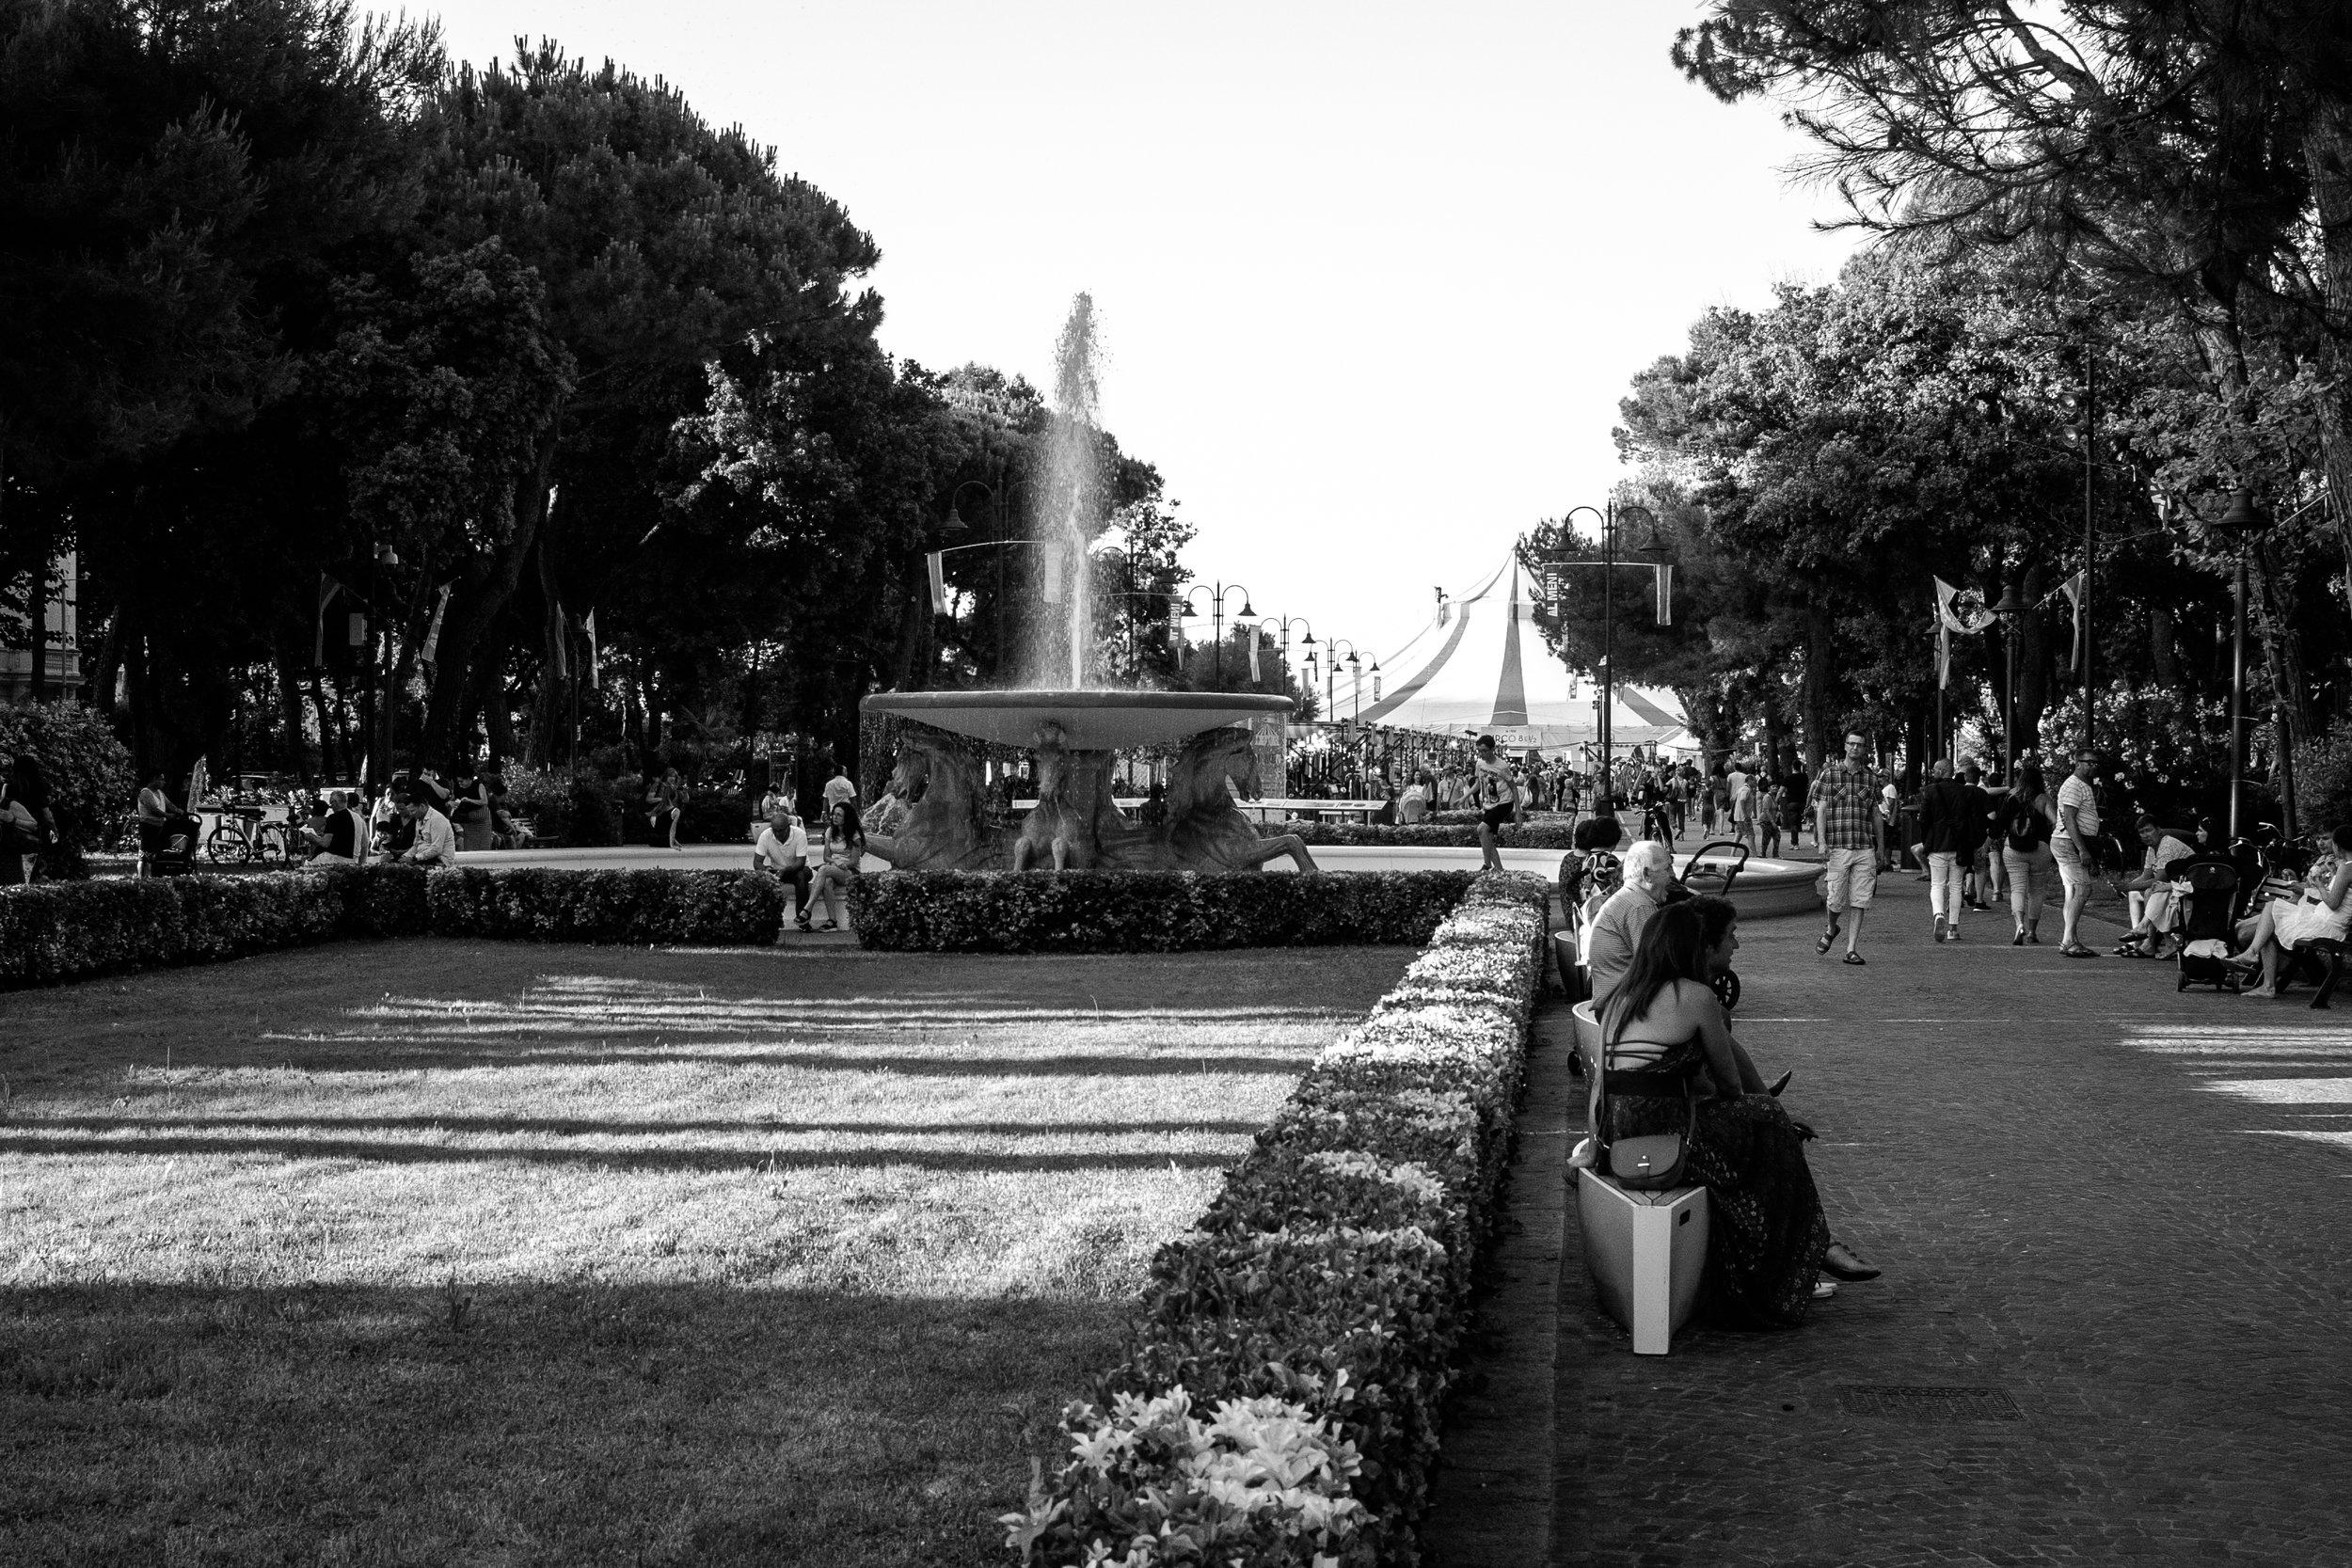 Idyllic scenes from Rimini.